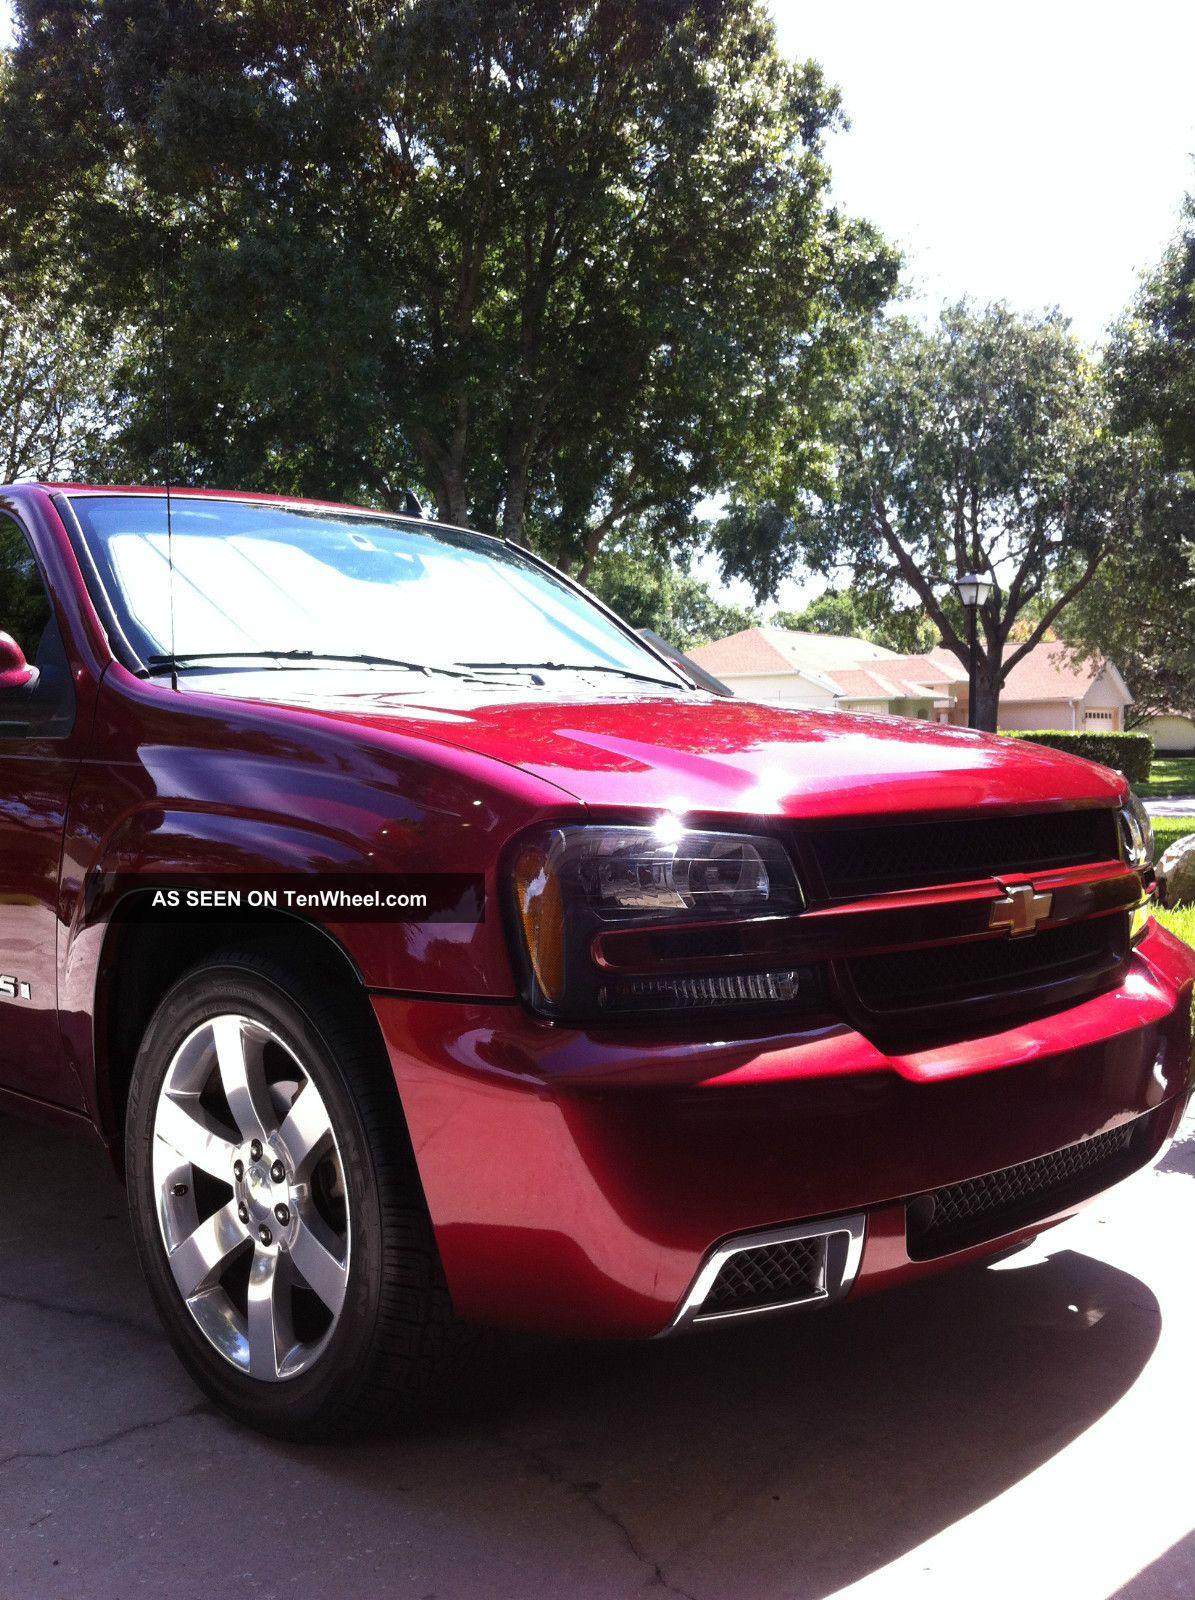 2007 Chevrolet Trailblazer Ss 6. 0l Ls2